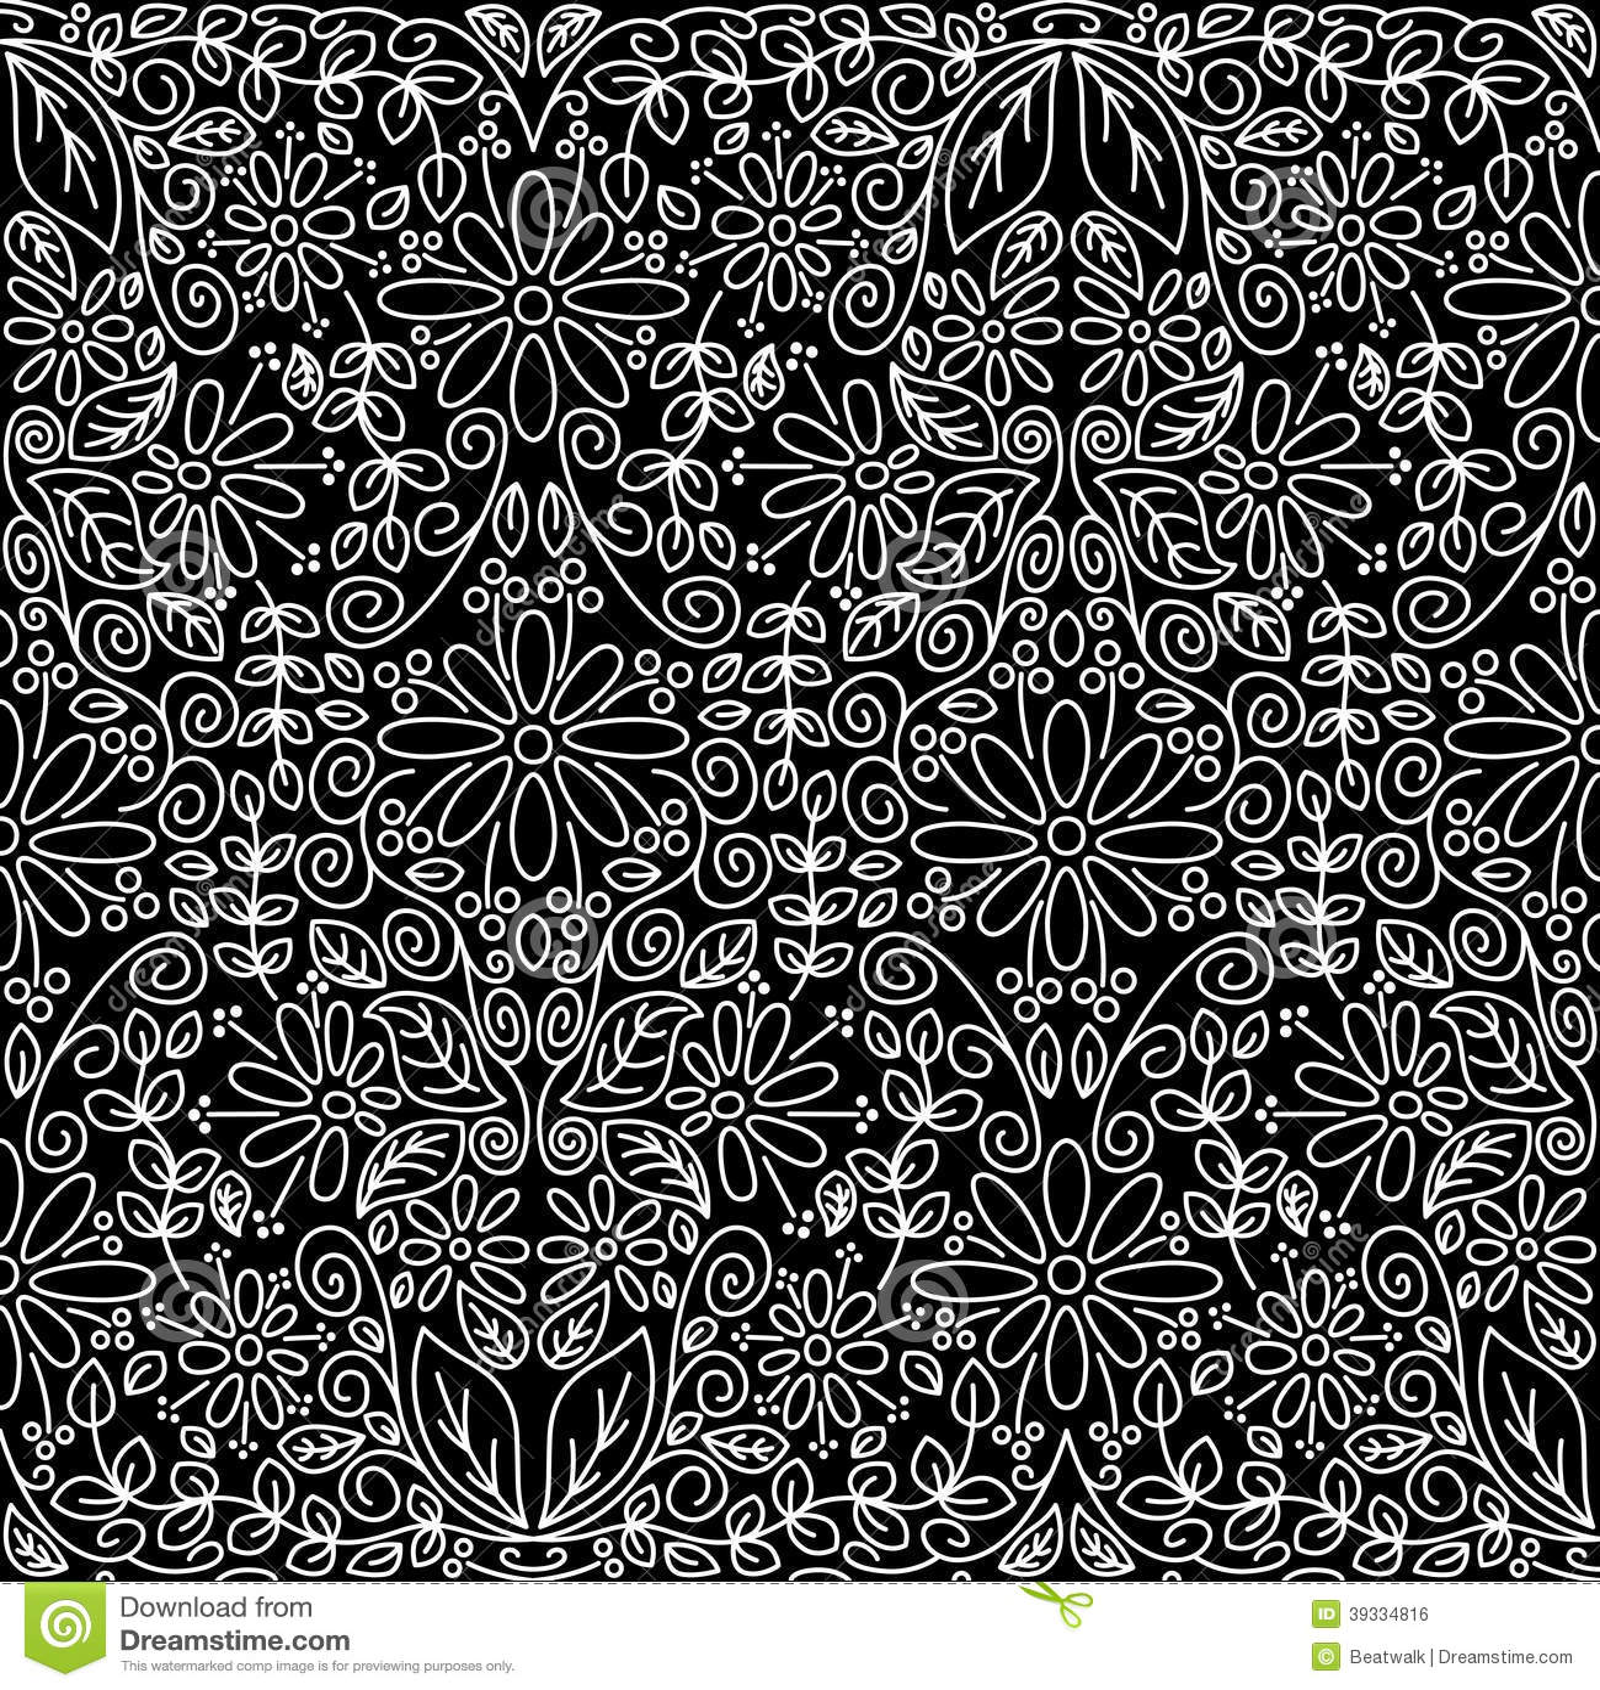 Seamless Vintage Floral Wallpaper